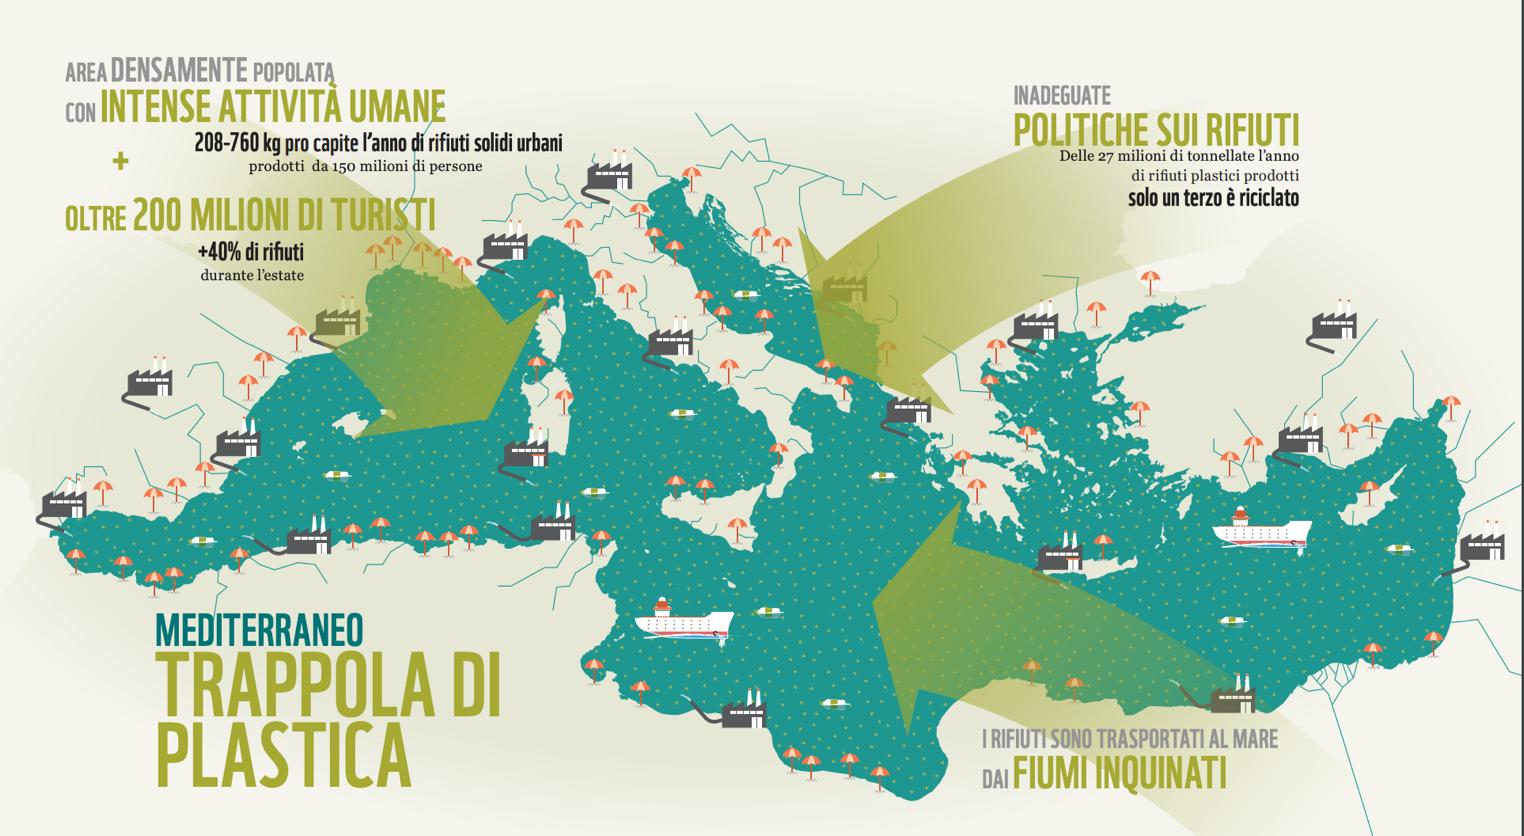 Mare Mediterraneo Cartina.Plastica Nei Mari Focus Sul Mediterraneo Blue Eco Line